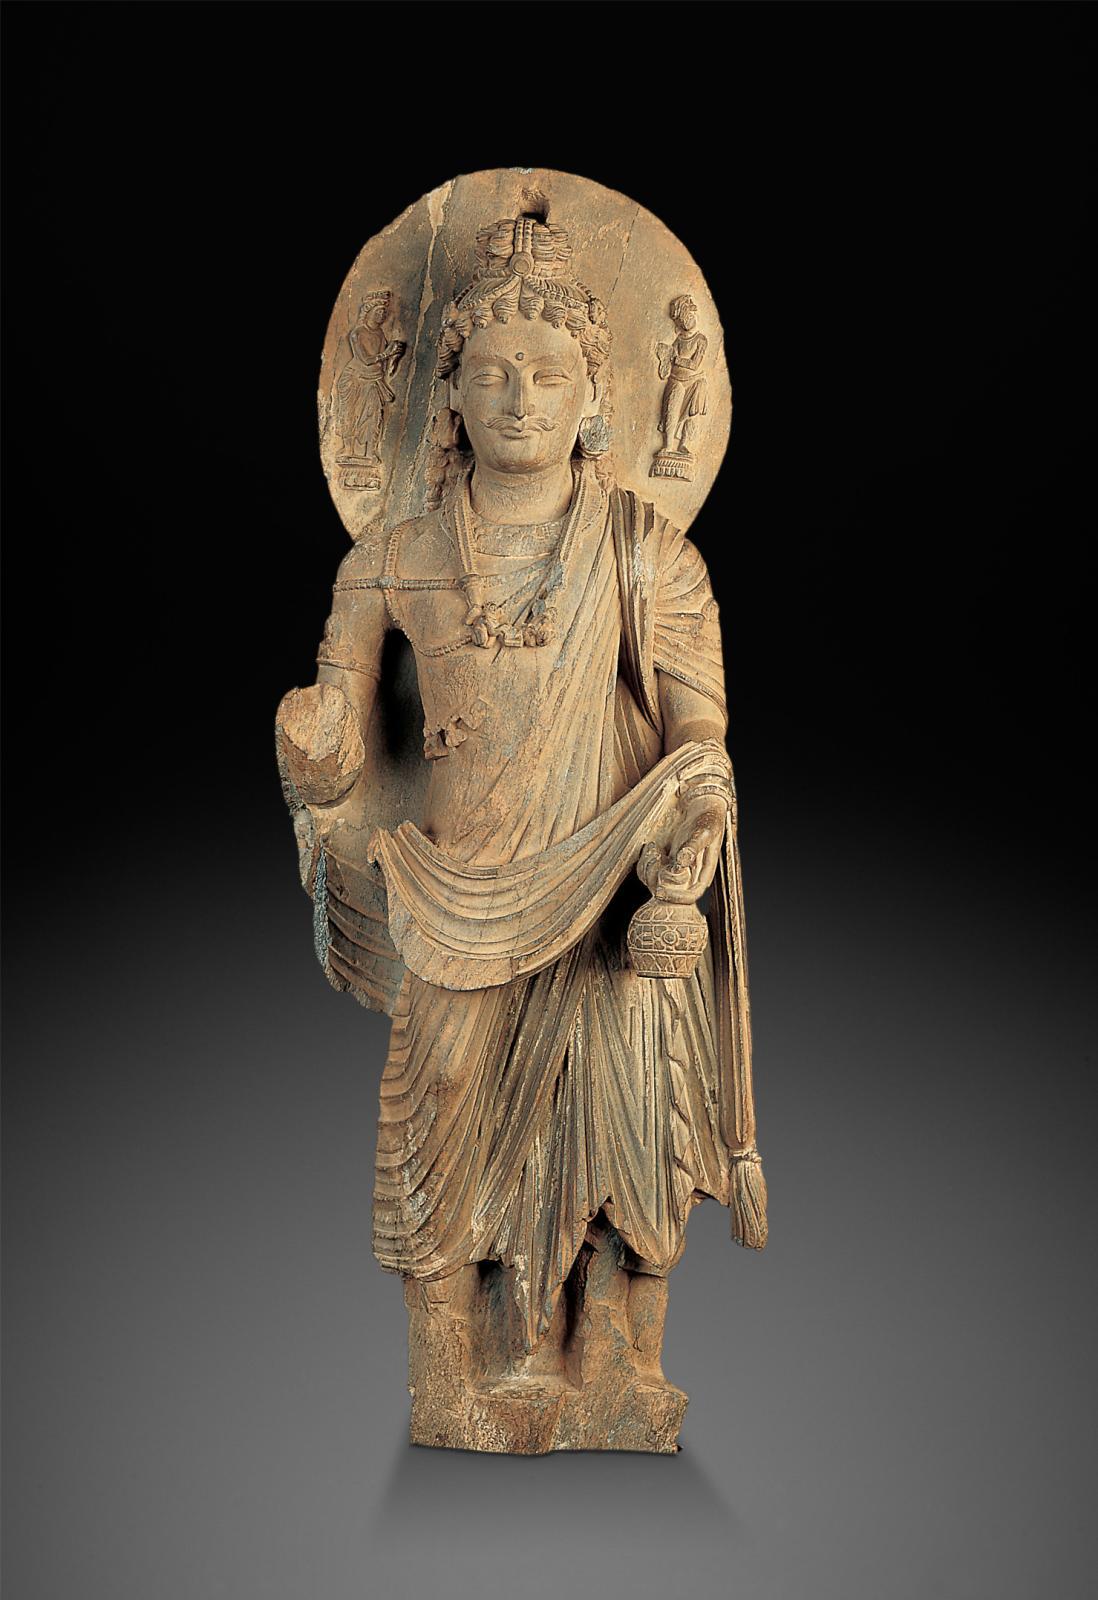 Bodhisattva Maitreya, Pakistan ou Afghanistan, époque Kushan, IIIesiècle, schiste gris, musée des beaux-arts de Montréal. Photo MBAM, Chr